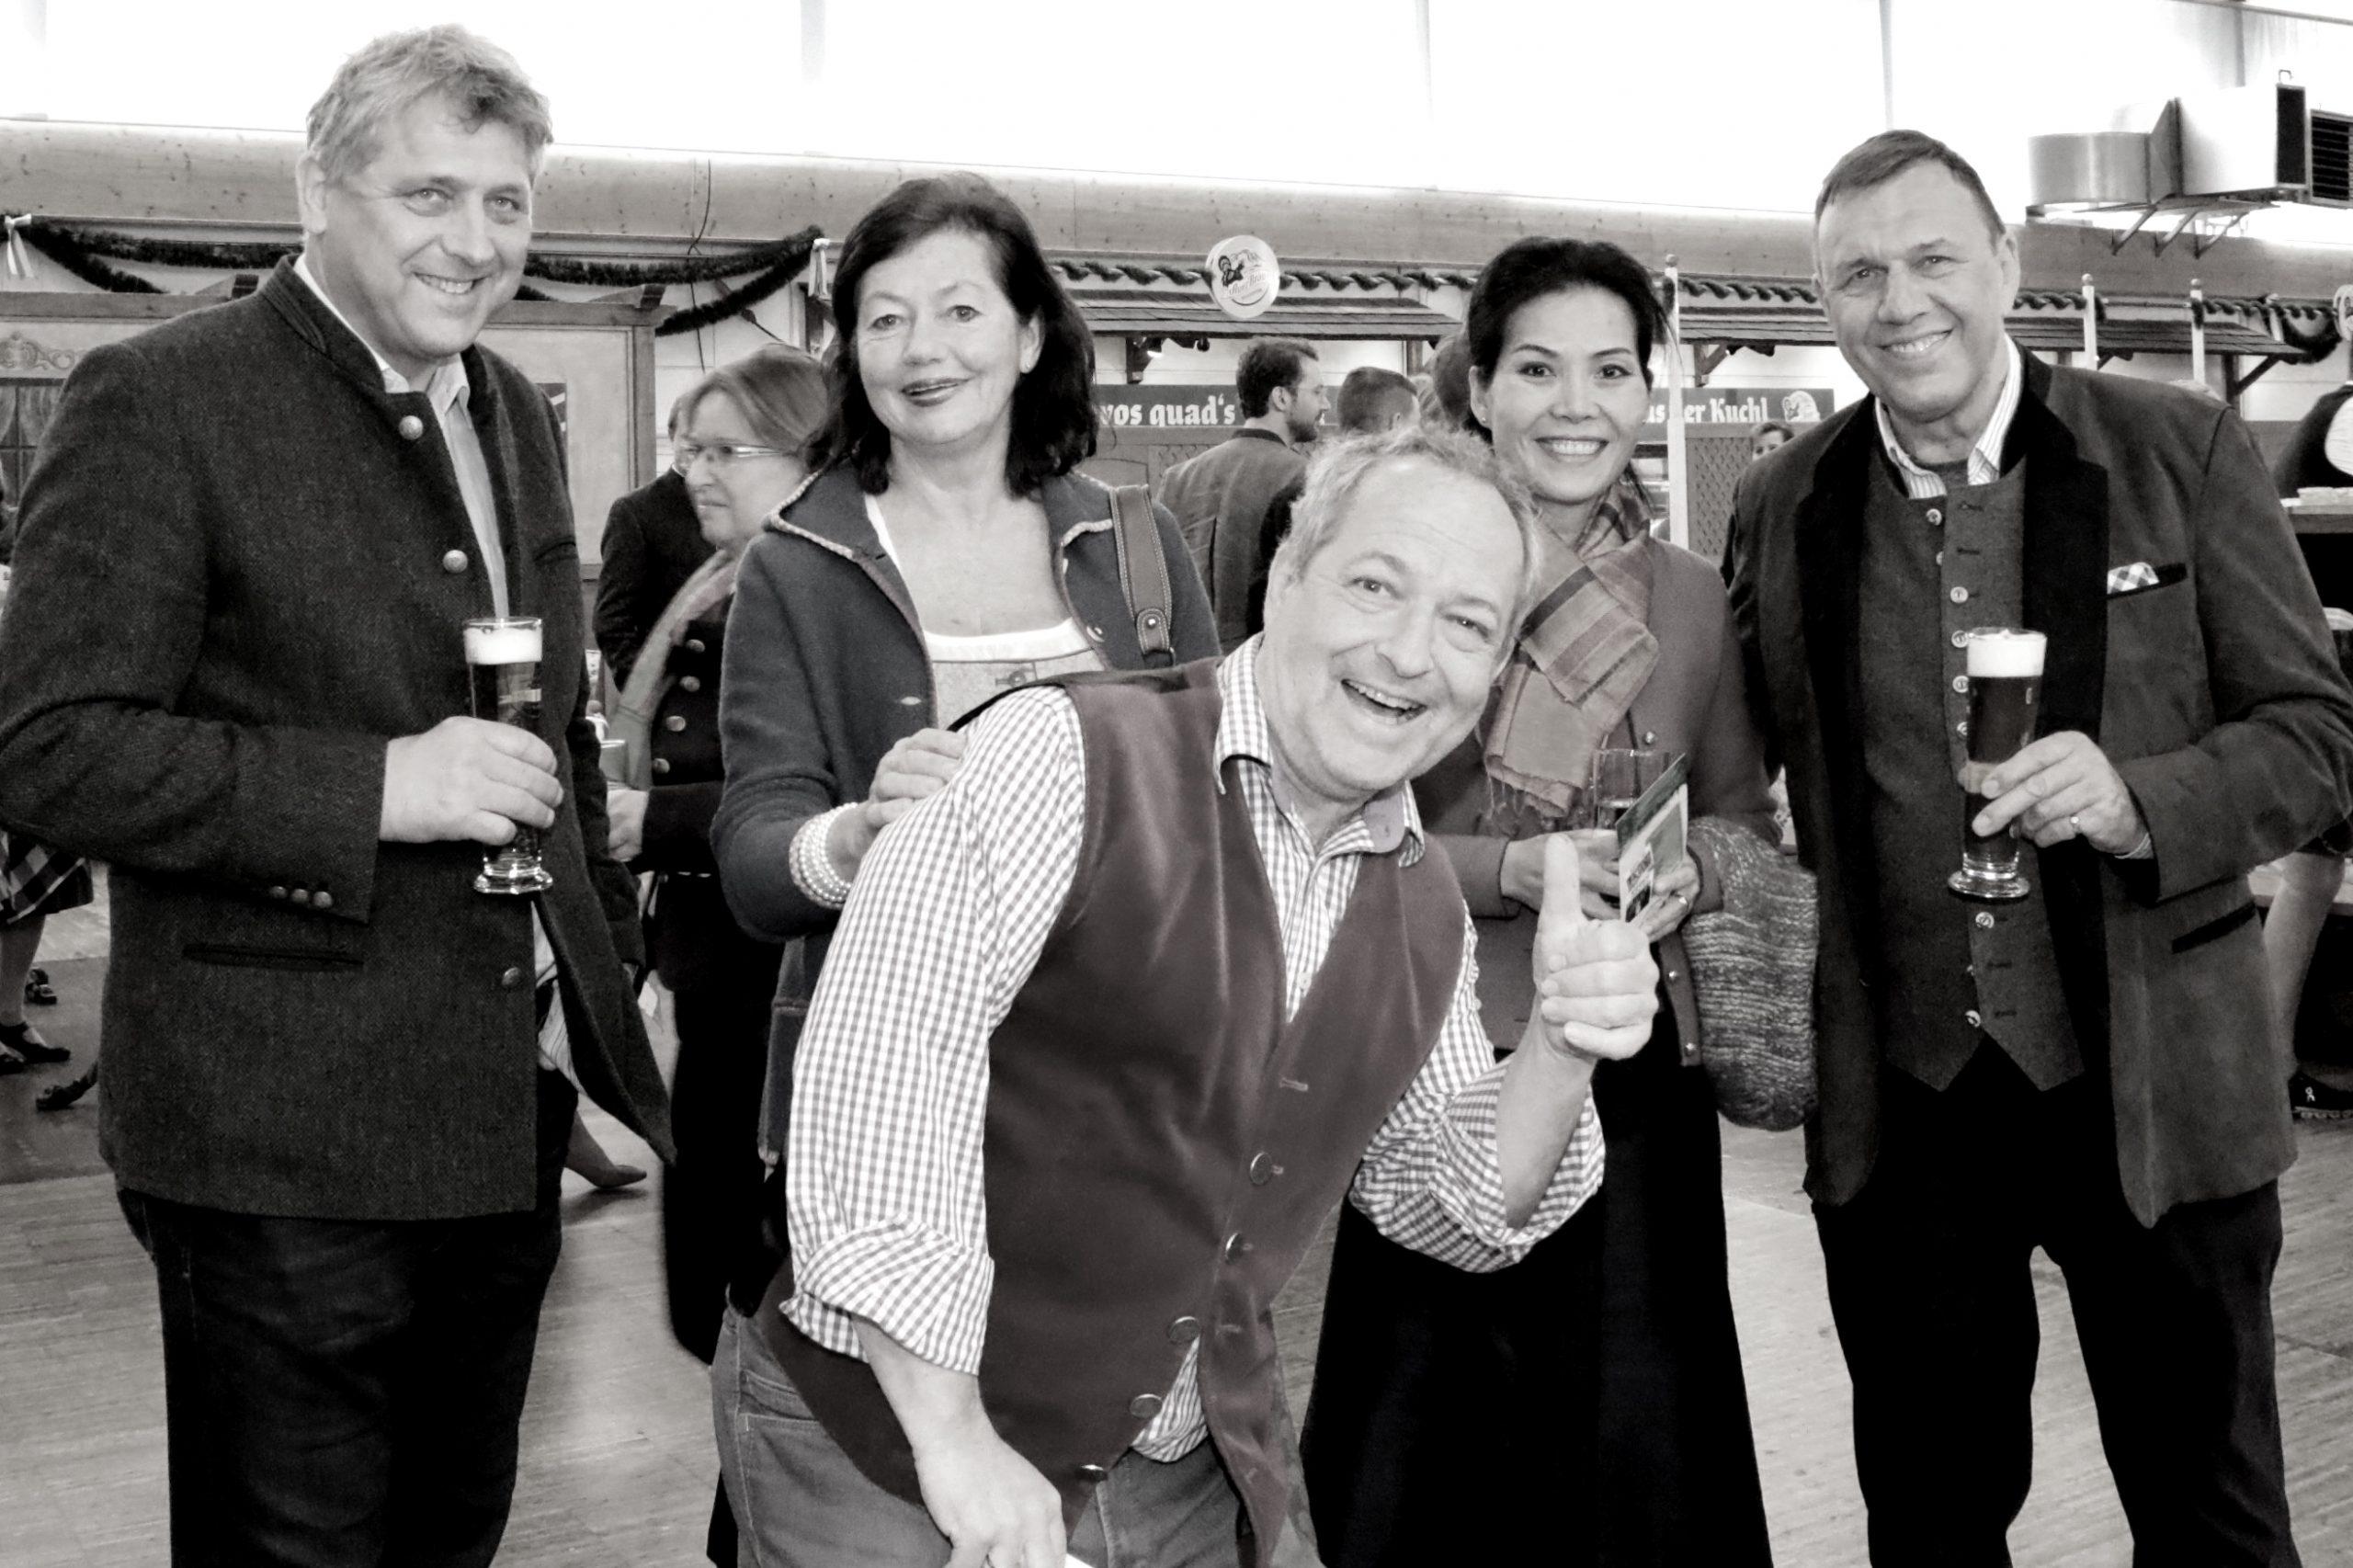 Gäste beim Starkbierfest Rosenheim